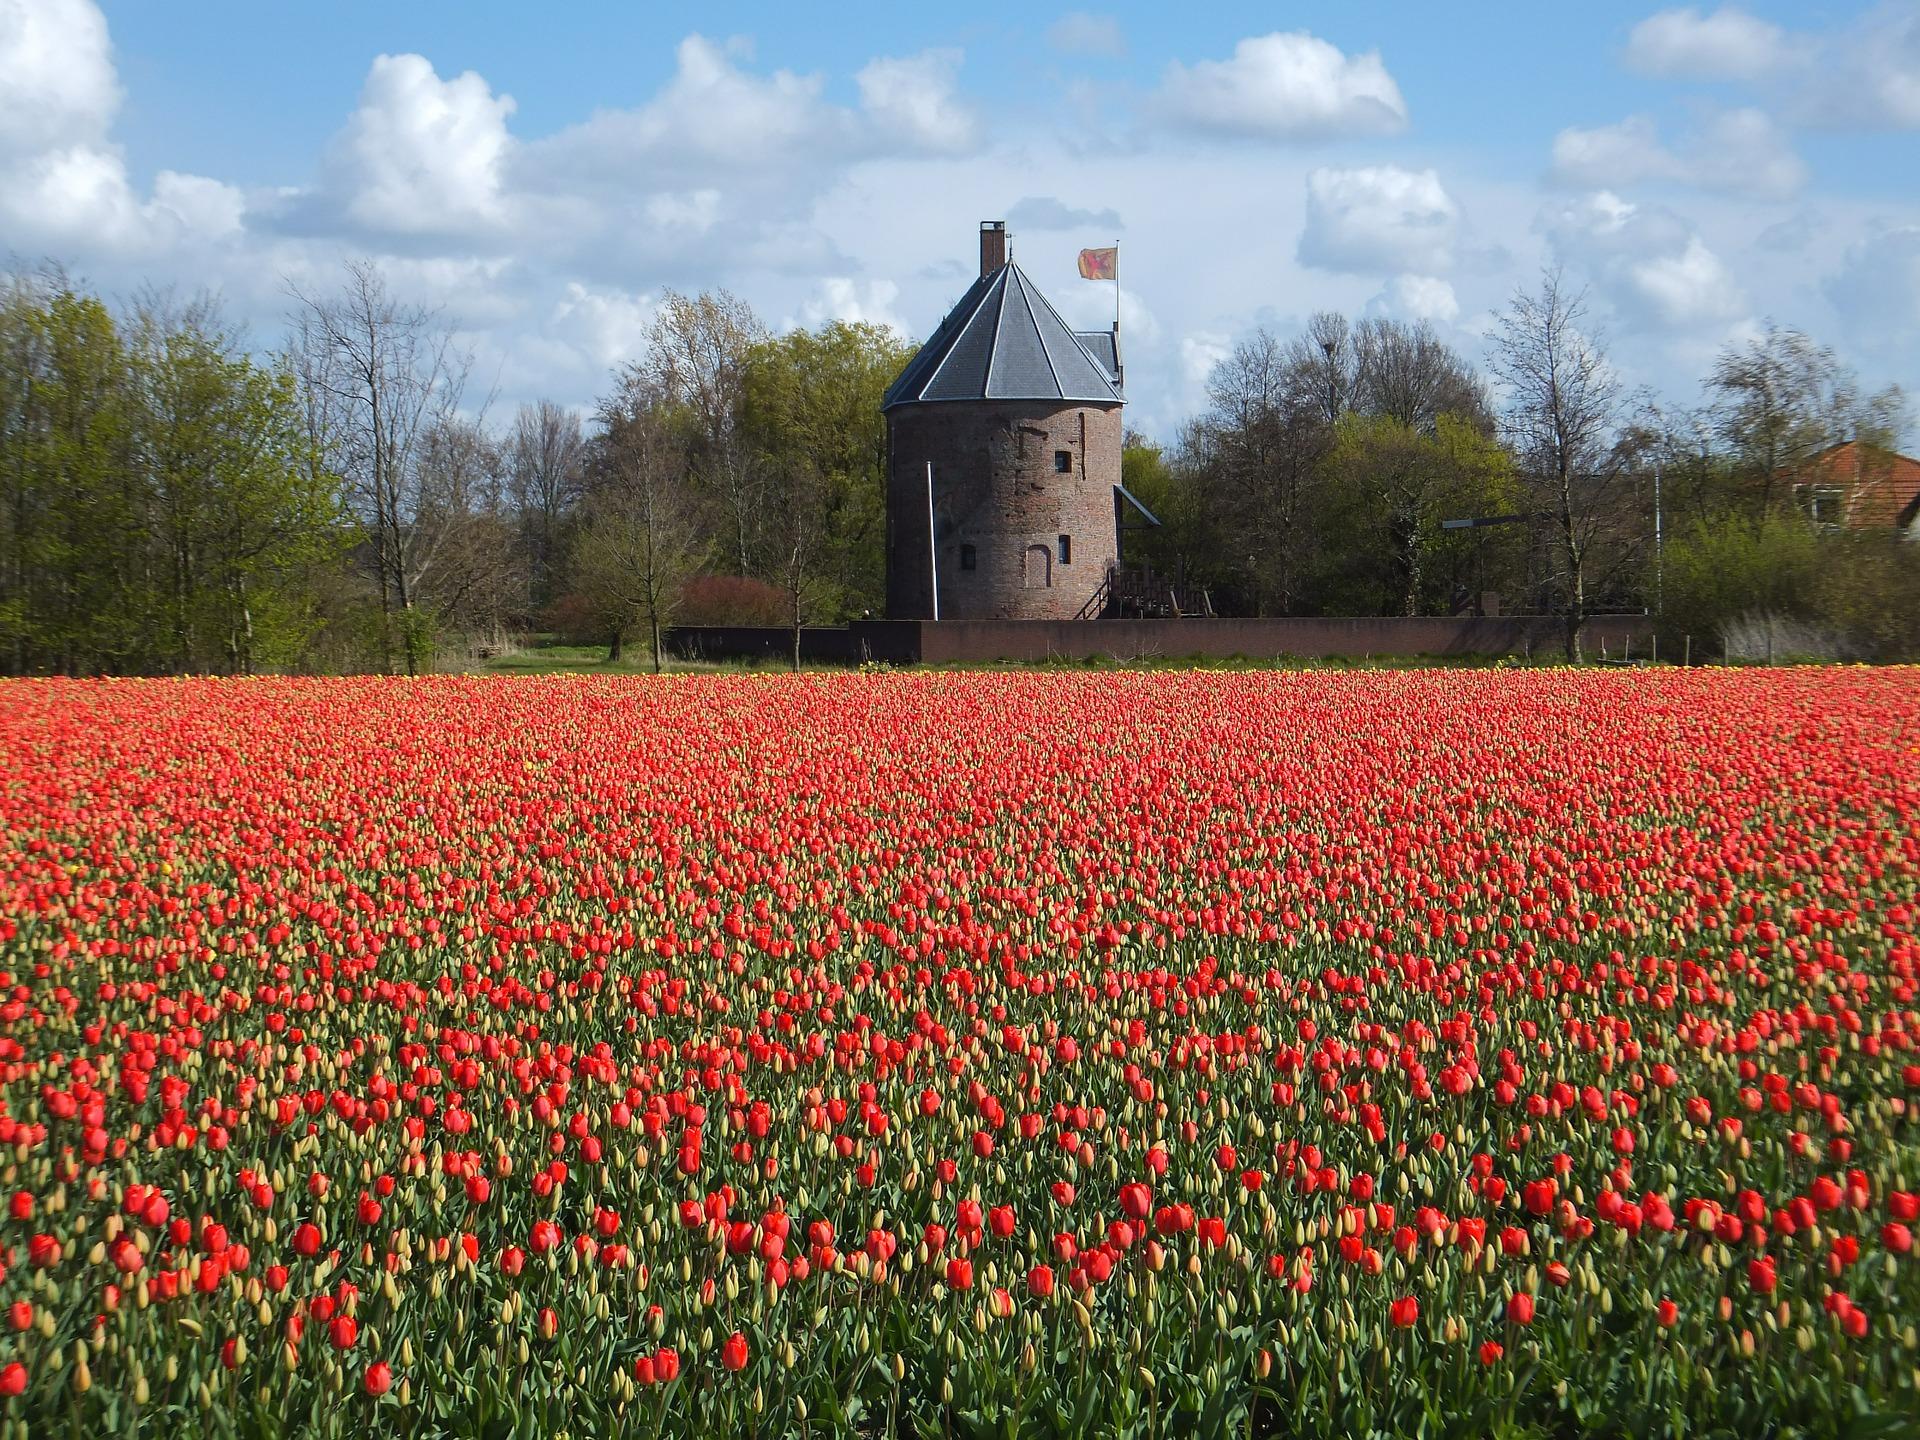 Campi di tulipani in Olanda - Foto di Jmpoppelier da Pixabay